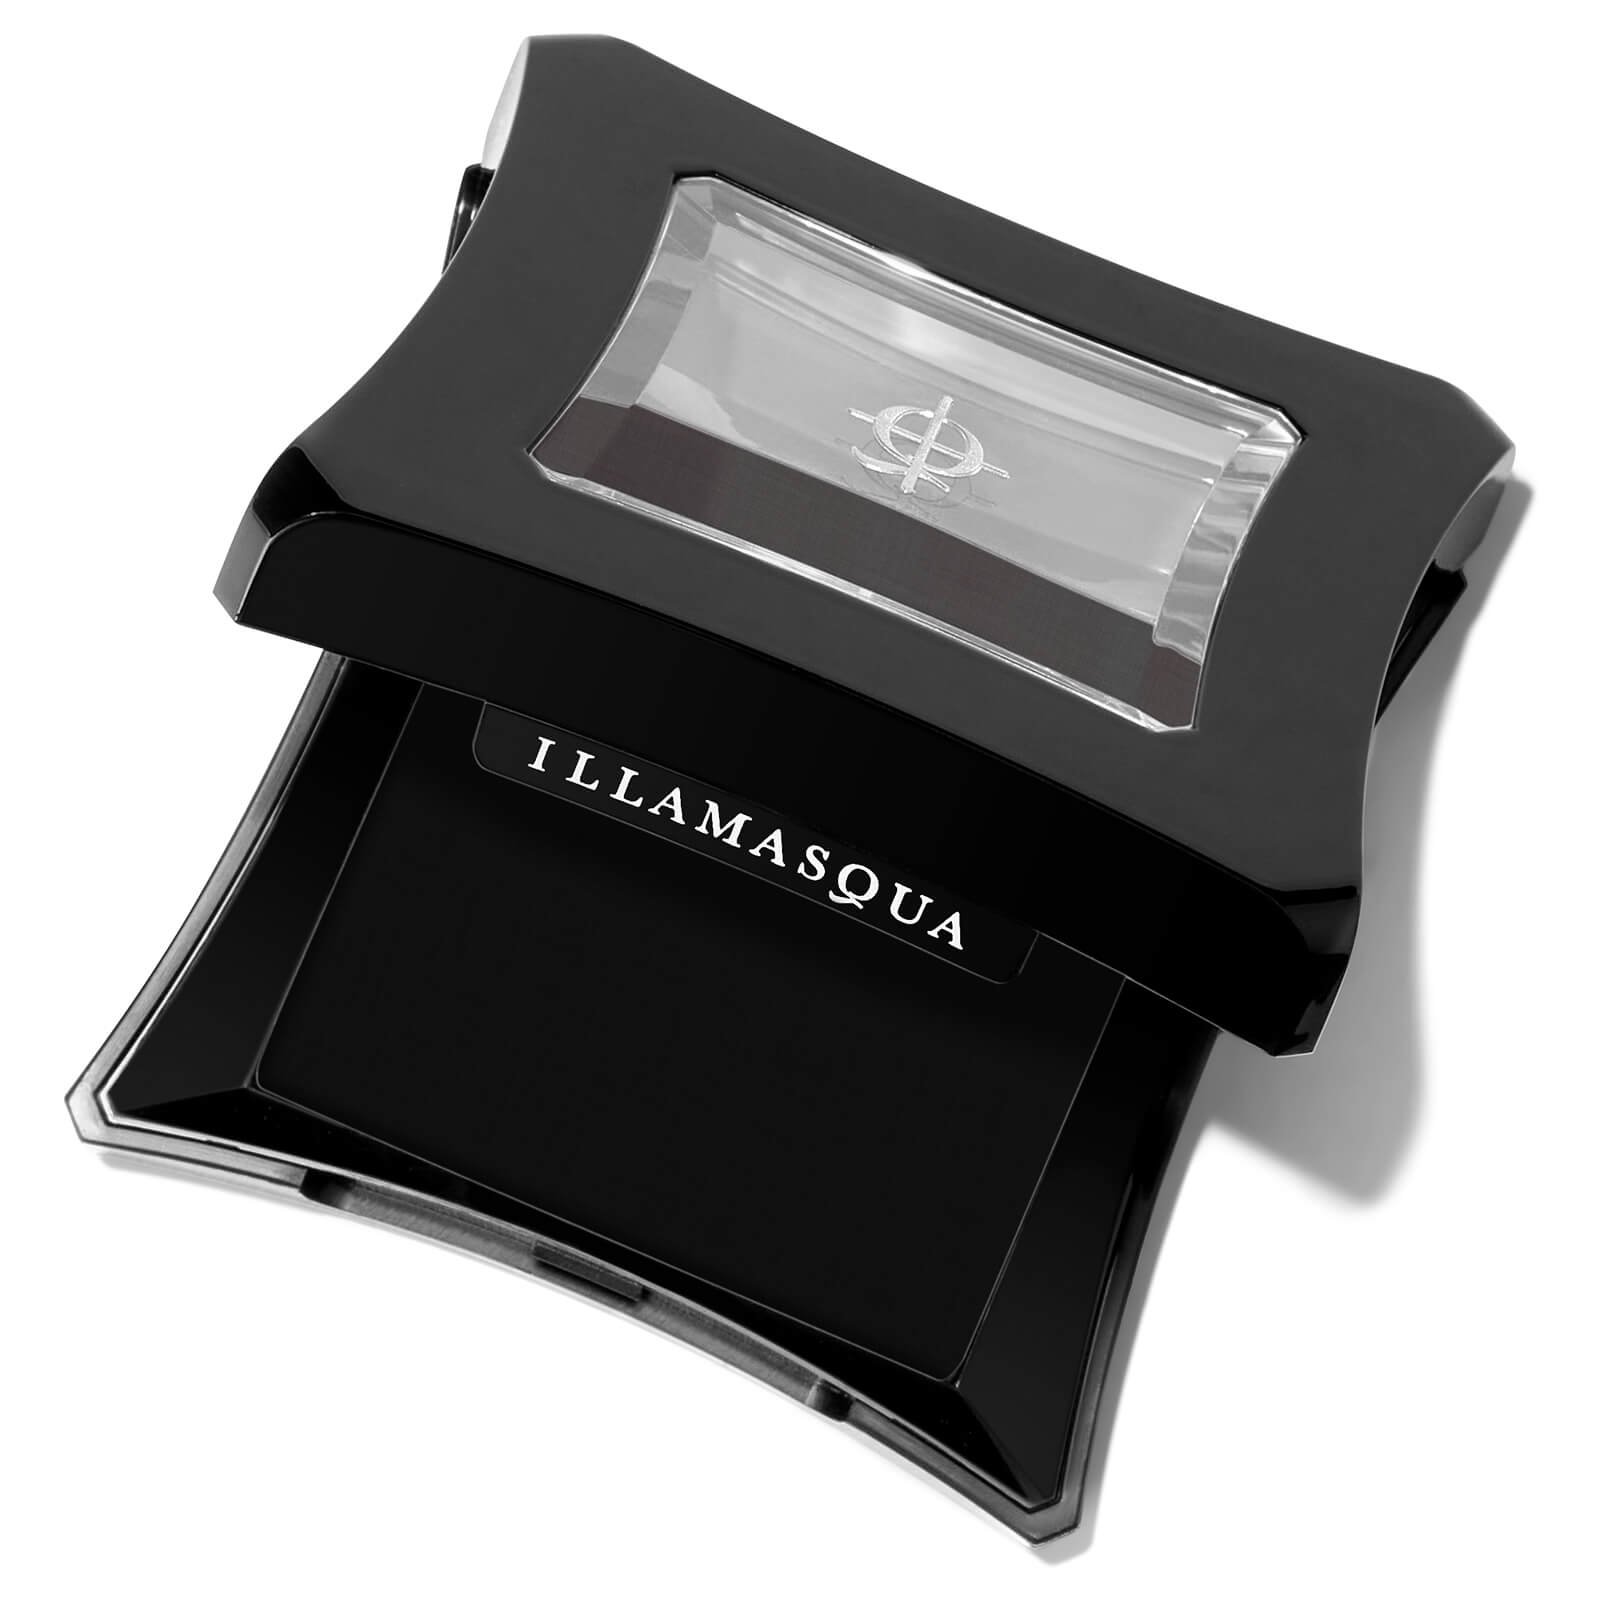 Тени для век Illamasqua Eye Shadow 2 г (различные оттенки) - Obsidian  - Купить